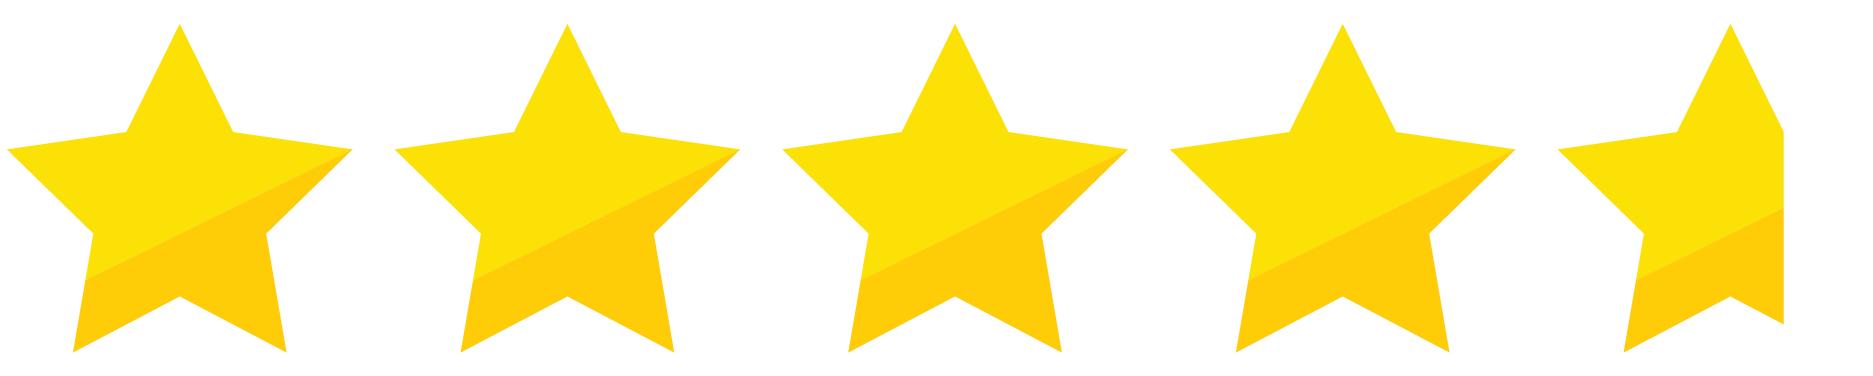 5Stars-HRonDemand.png